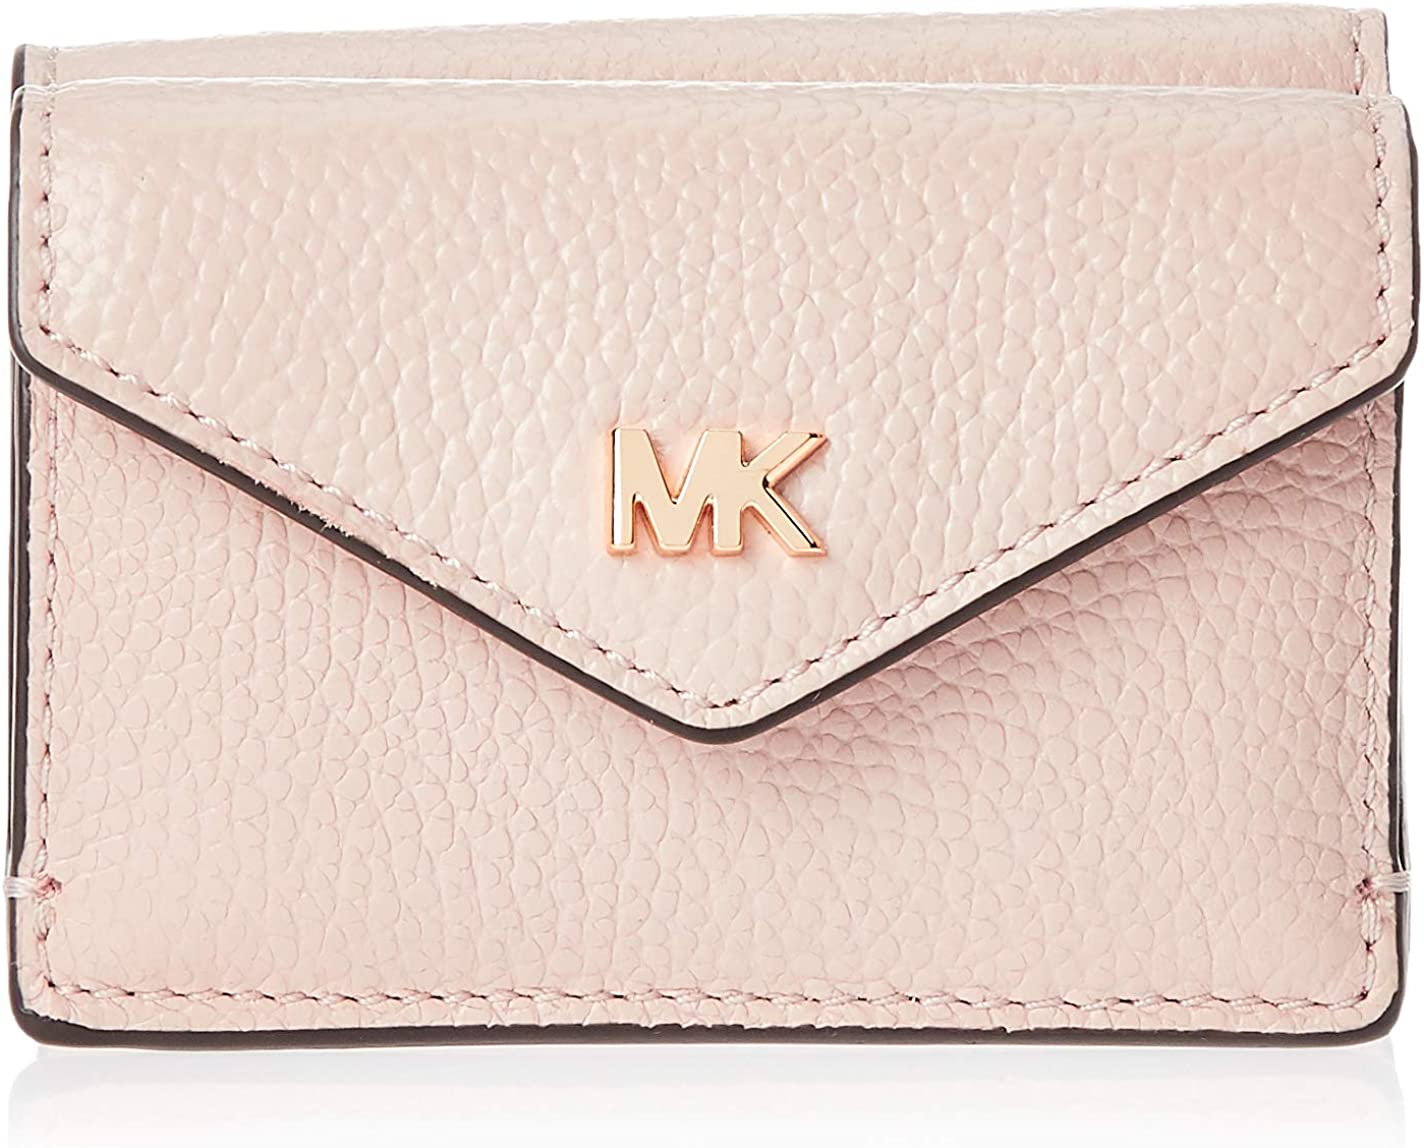 MICHAEL Michael Kors Pebble Leather Trifold Flap Wallet